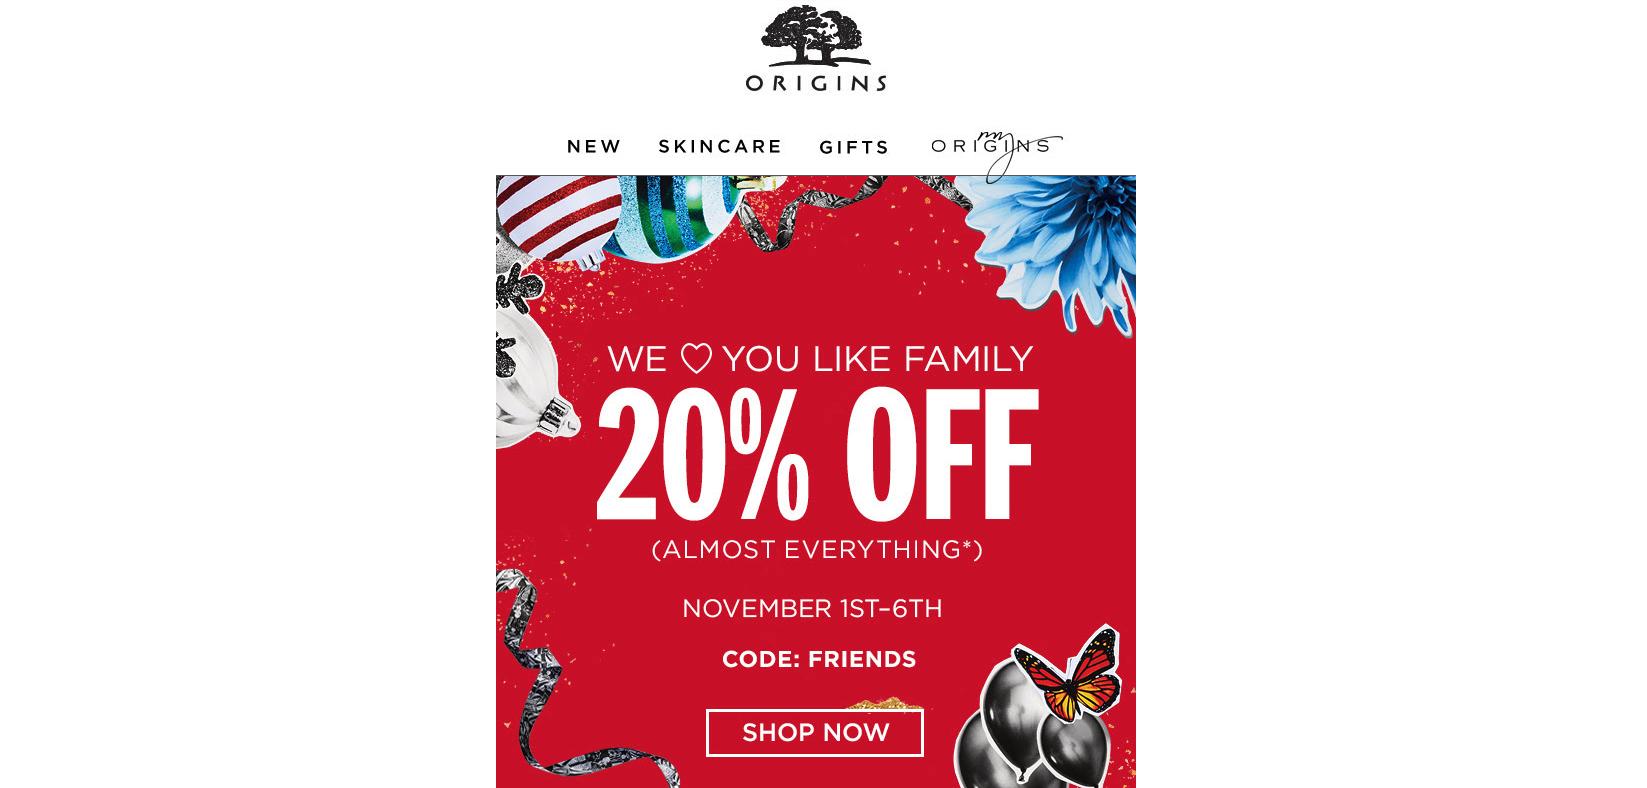 Origins Promotional ecommerce email marketing